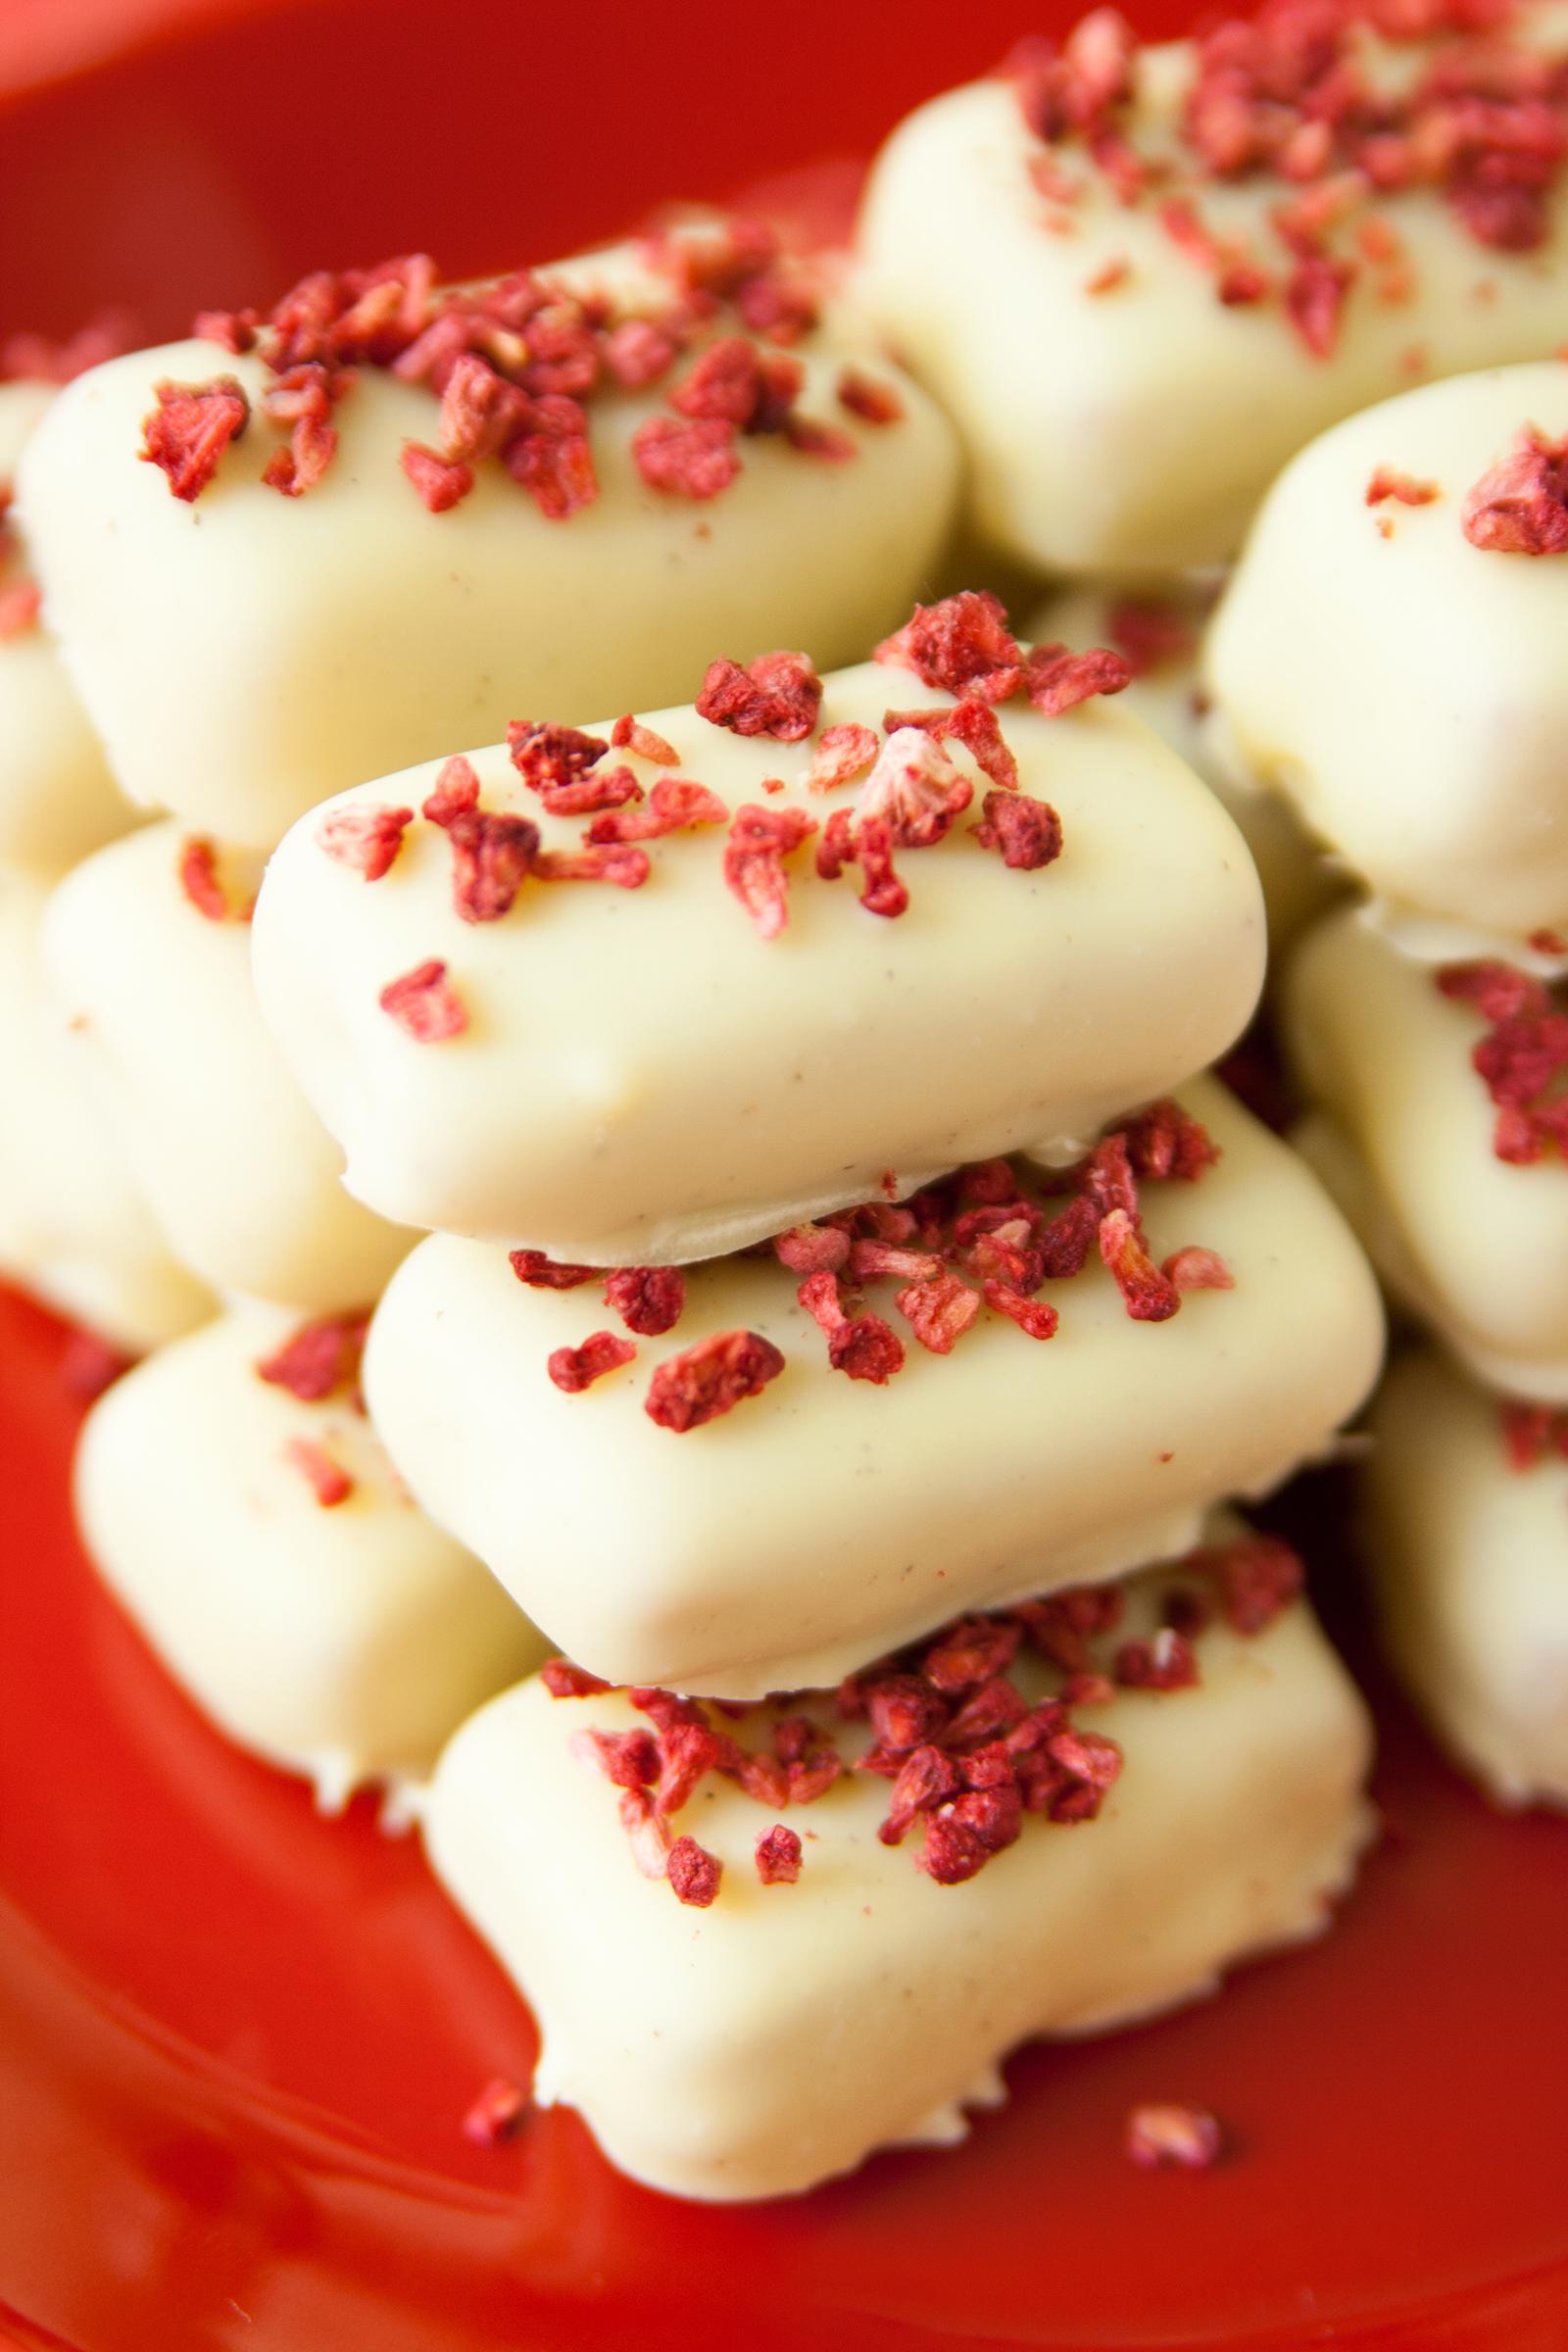 Hallonkola med vit choklad | Baker vs. Runner